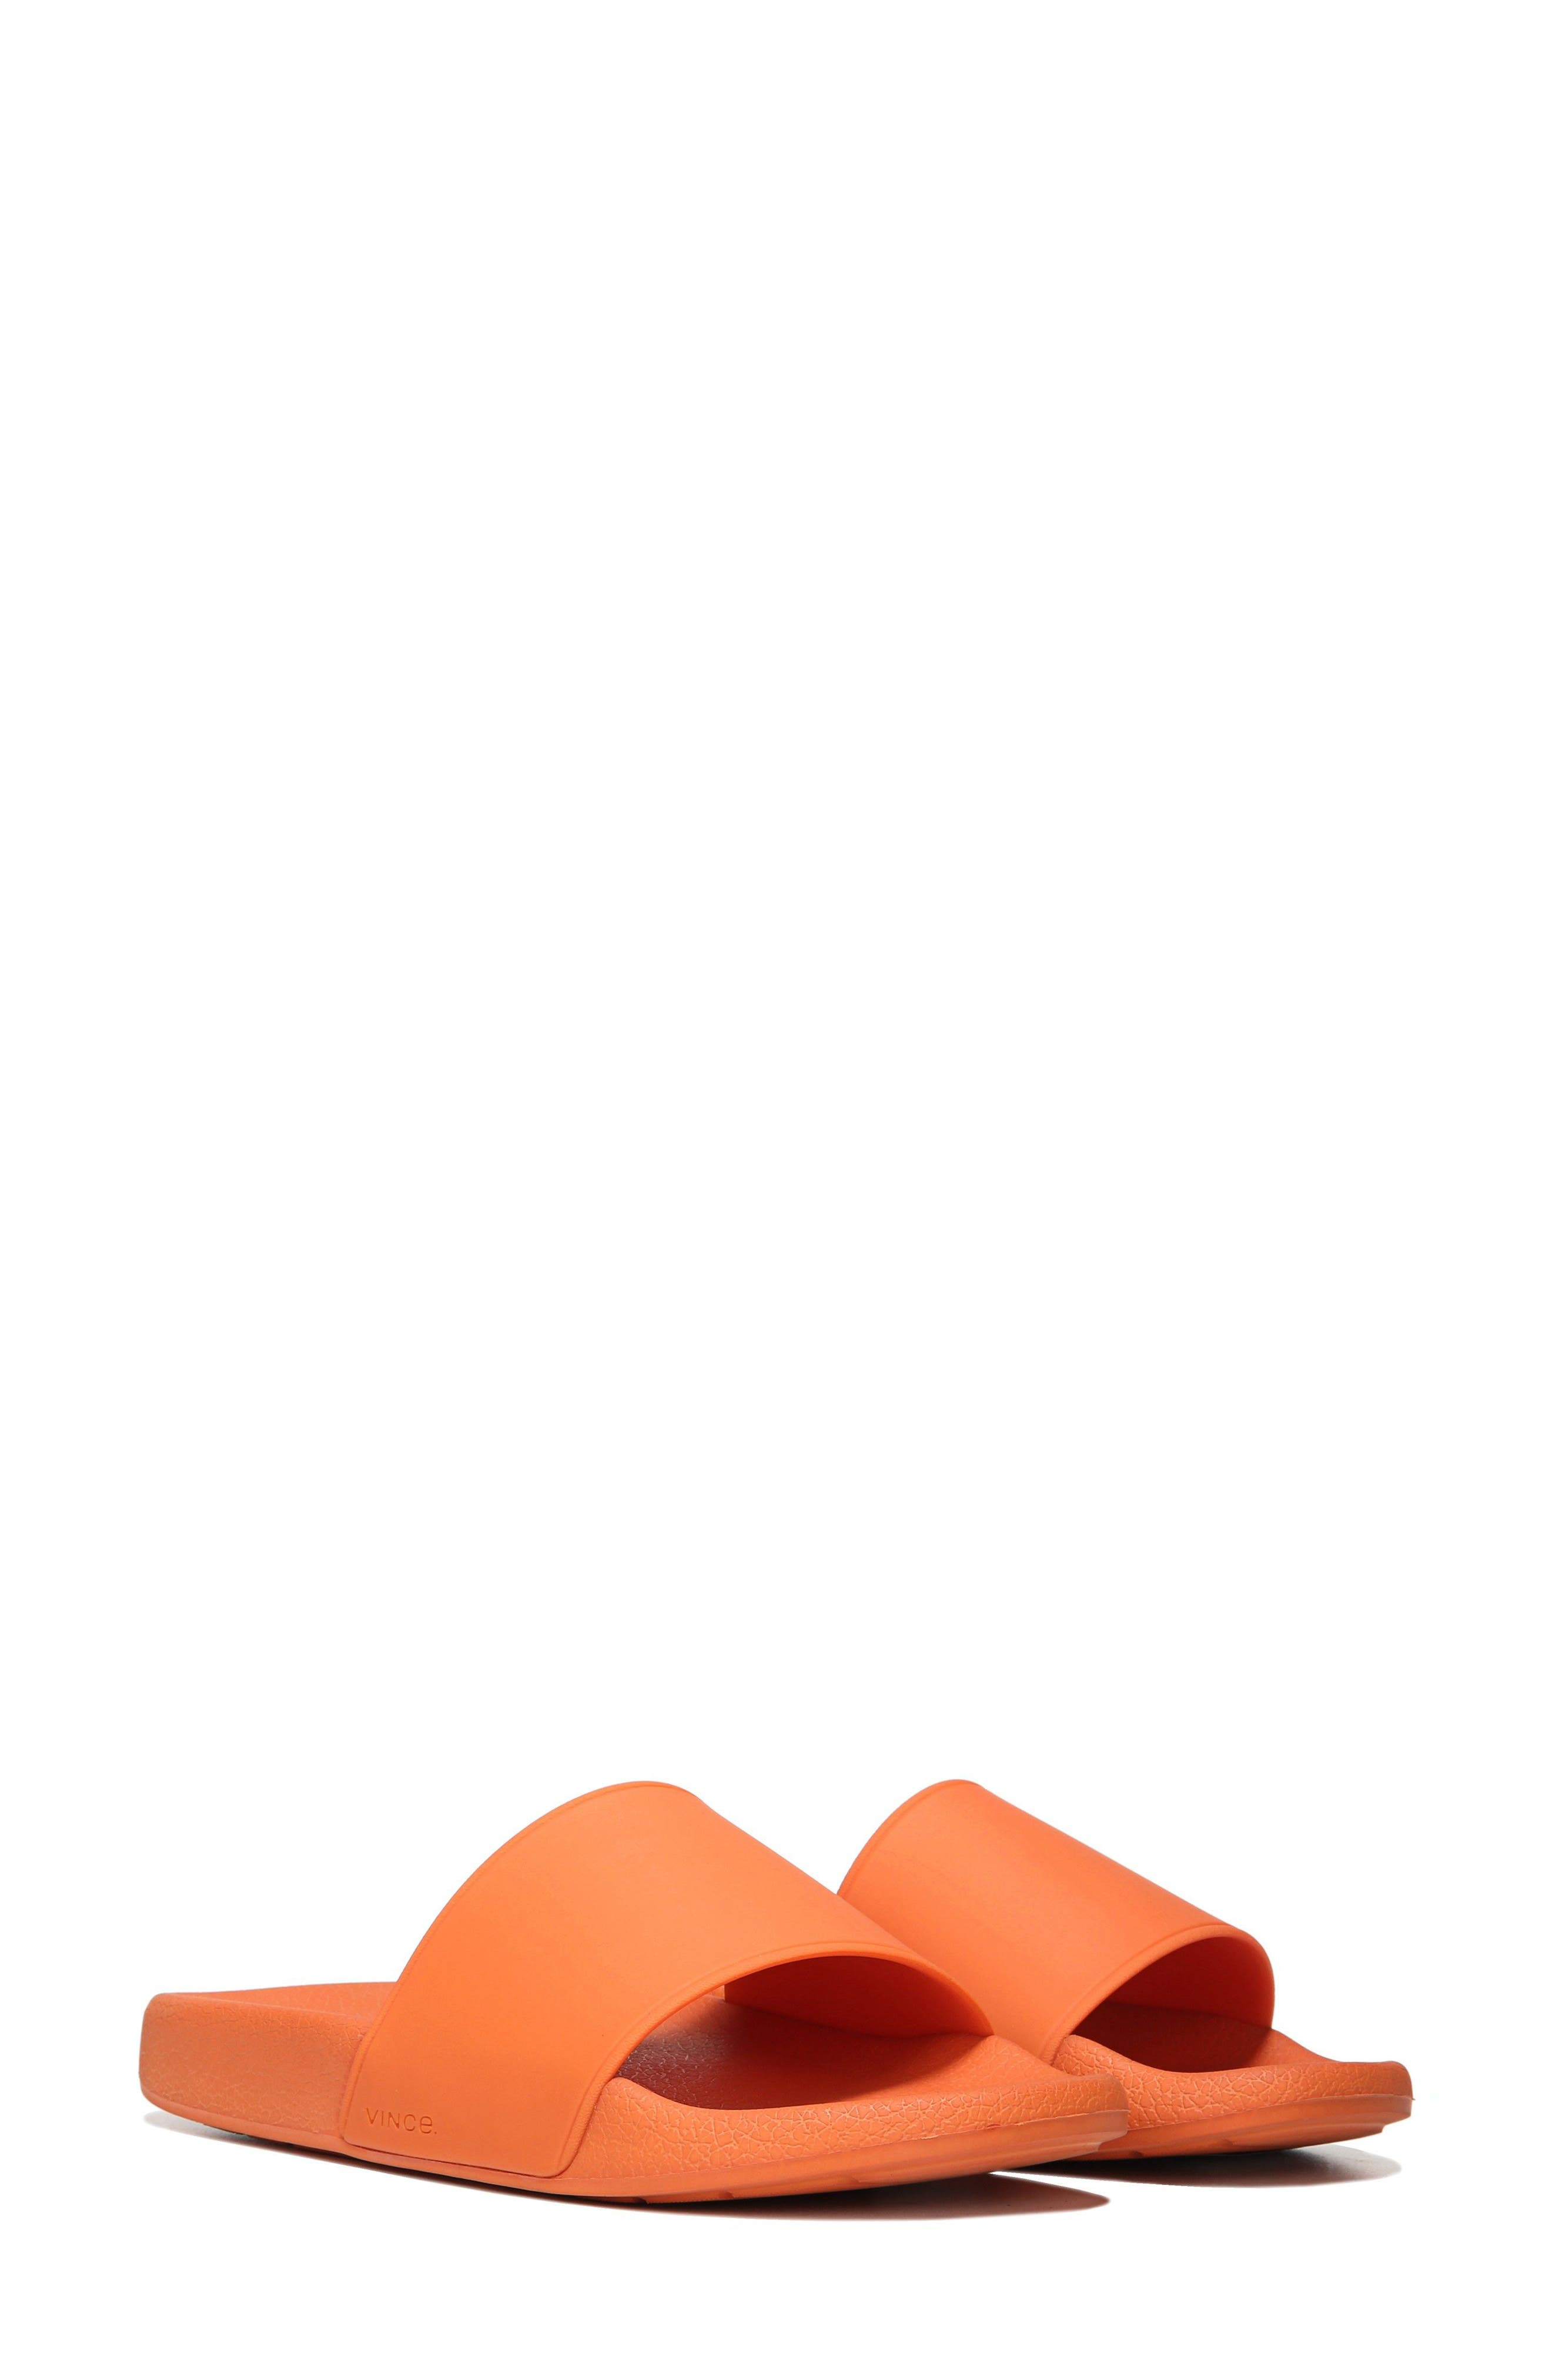 Westcoast Slide Sandal,                             Alternate thumbnail 51, color,